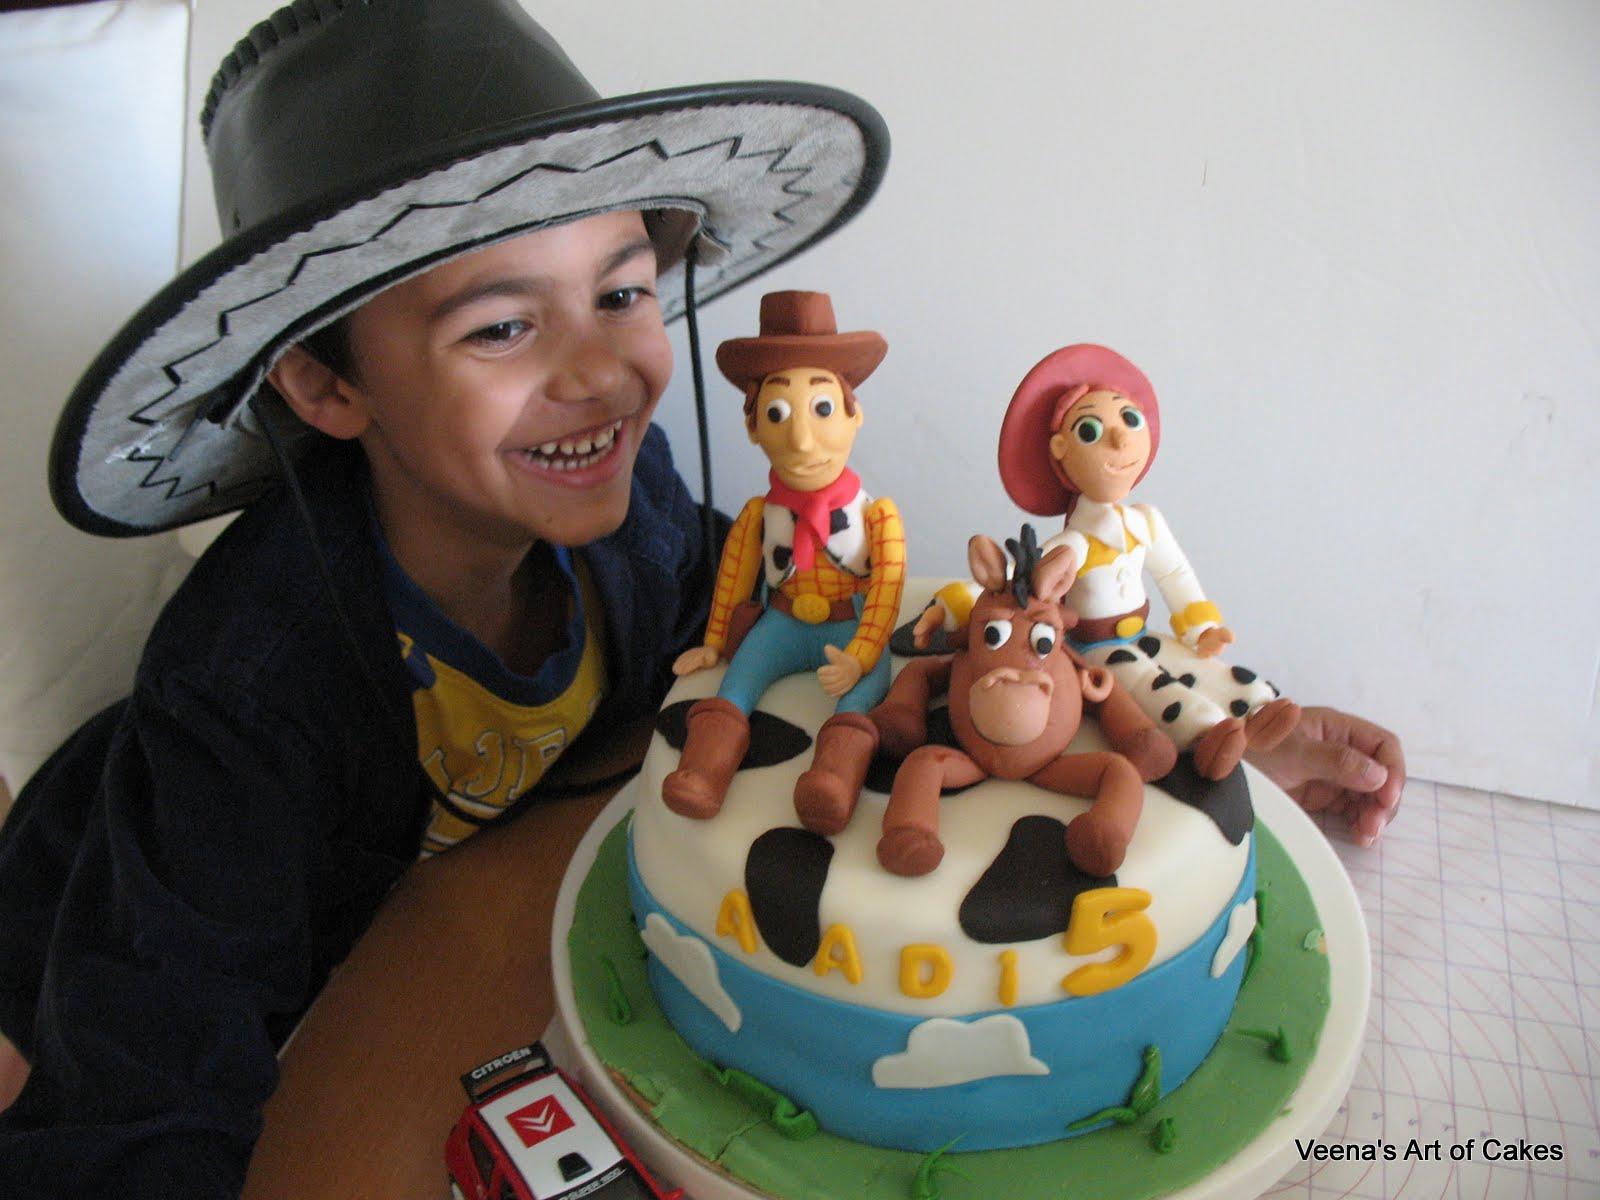 Toy Story Gum : Toy story cake with gumpaste woddy bulls eye and jessie